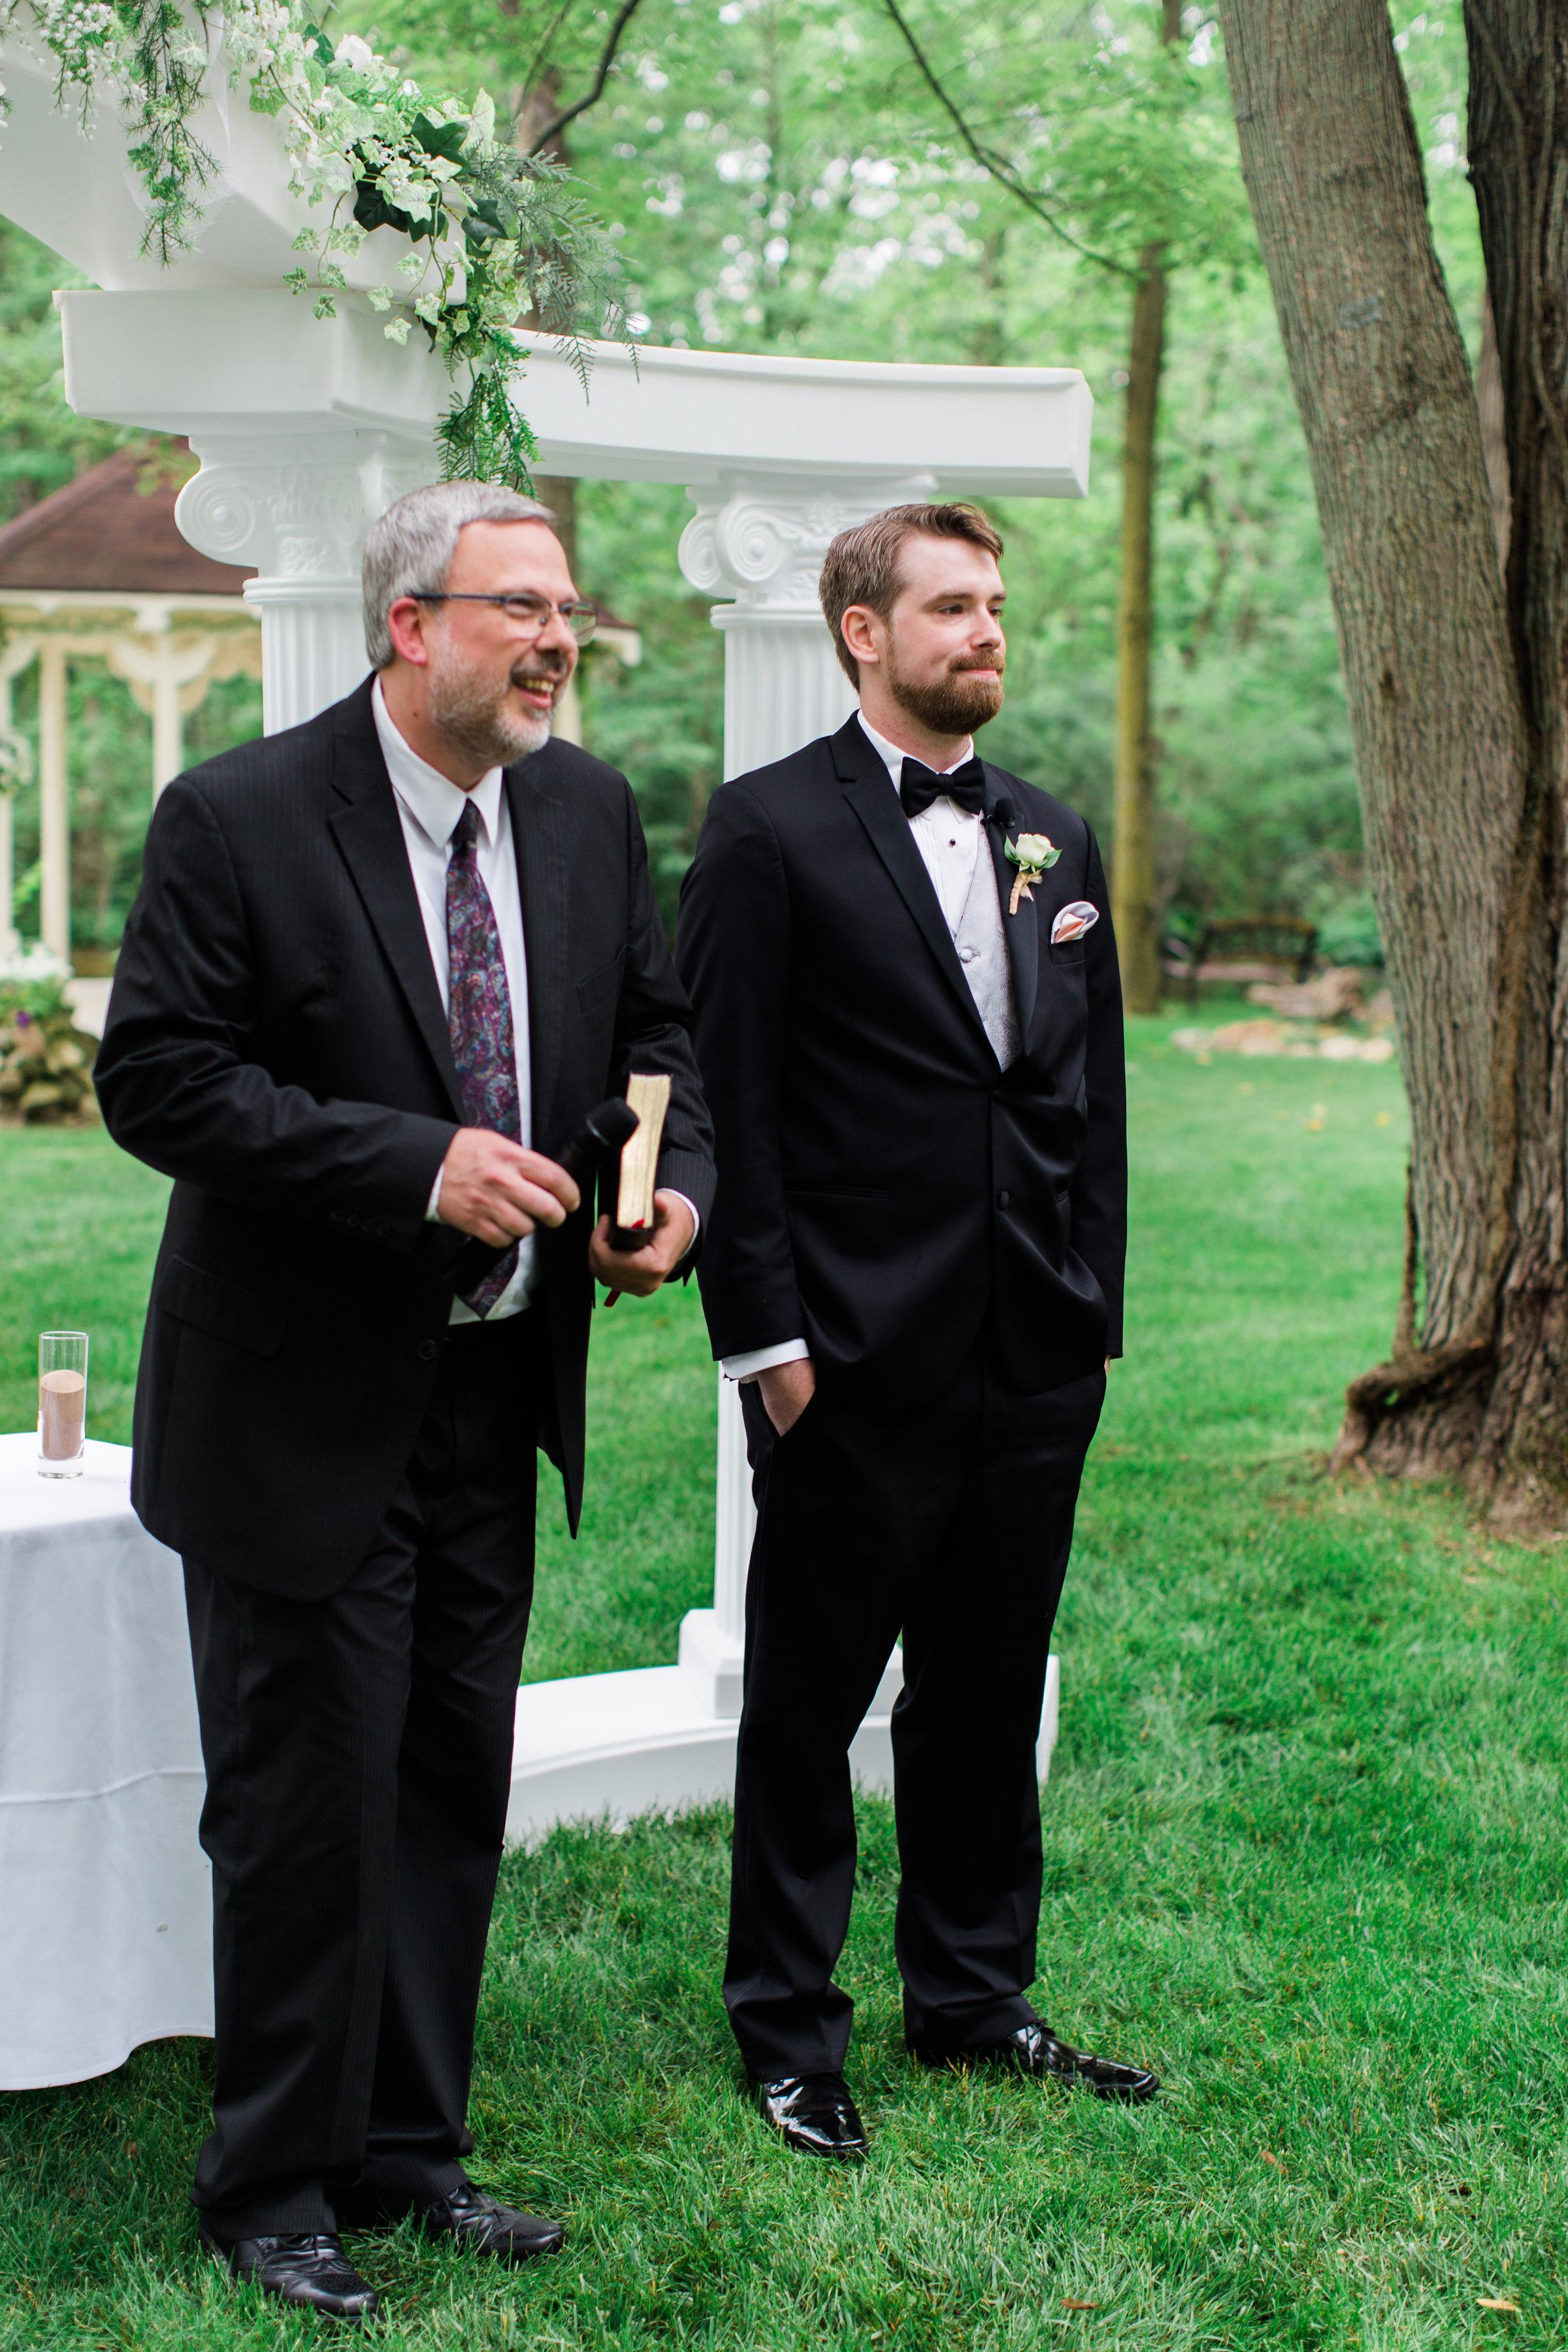 Conger+Wedding+Ceremony-1.jpg